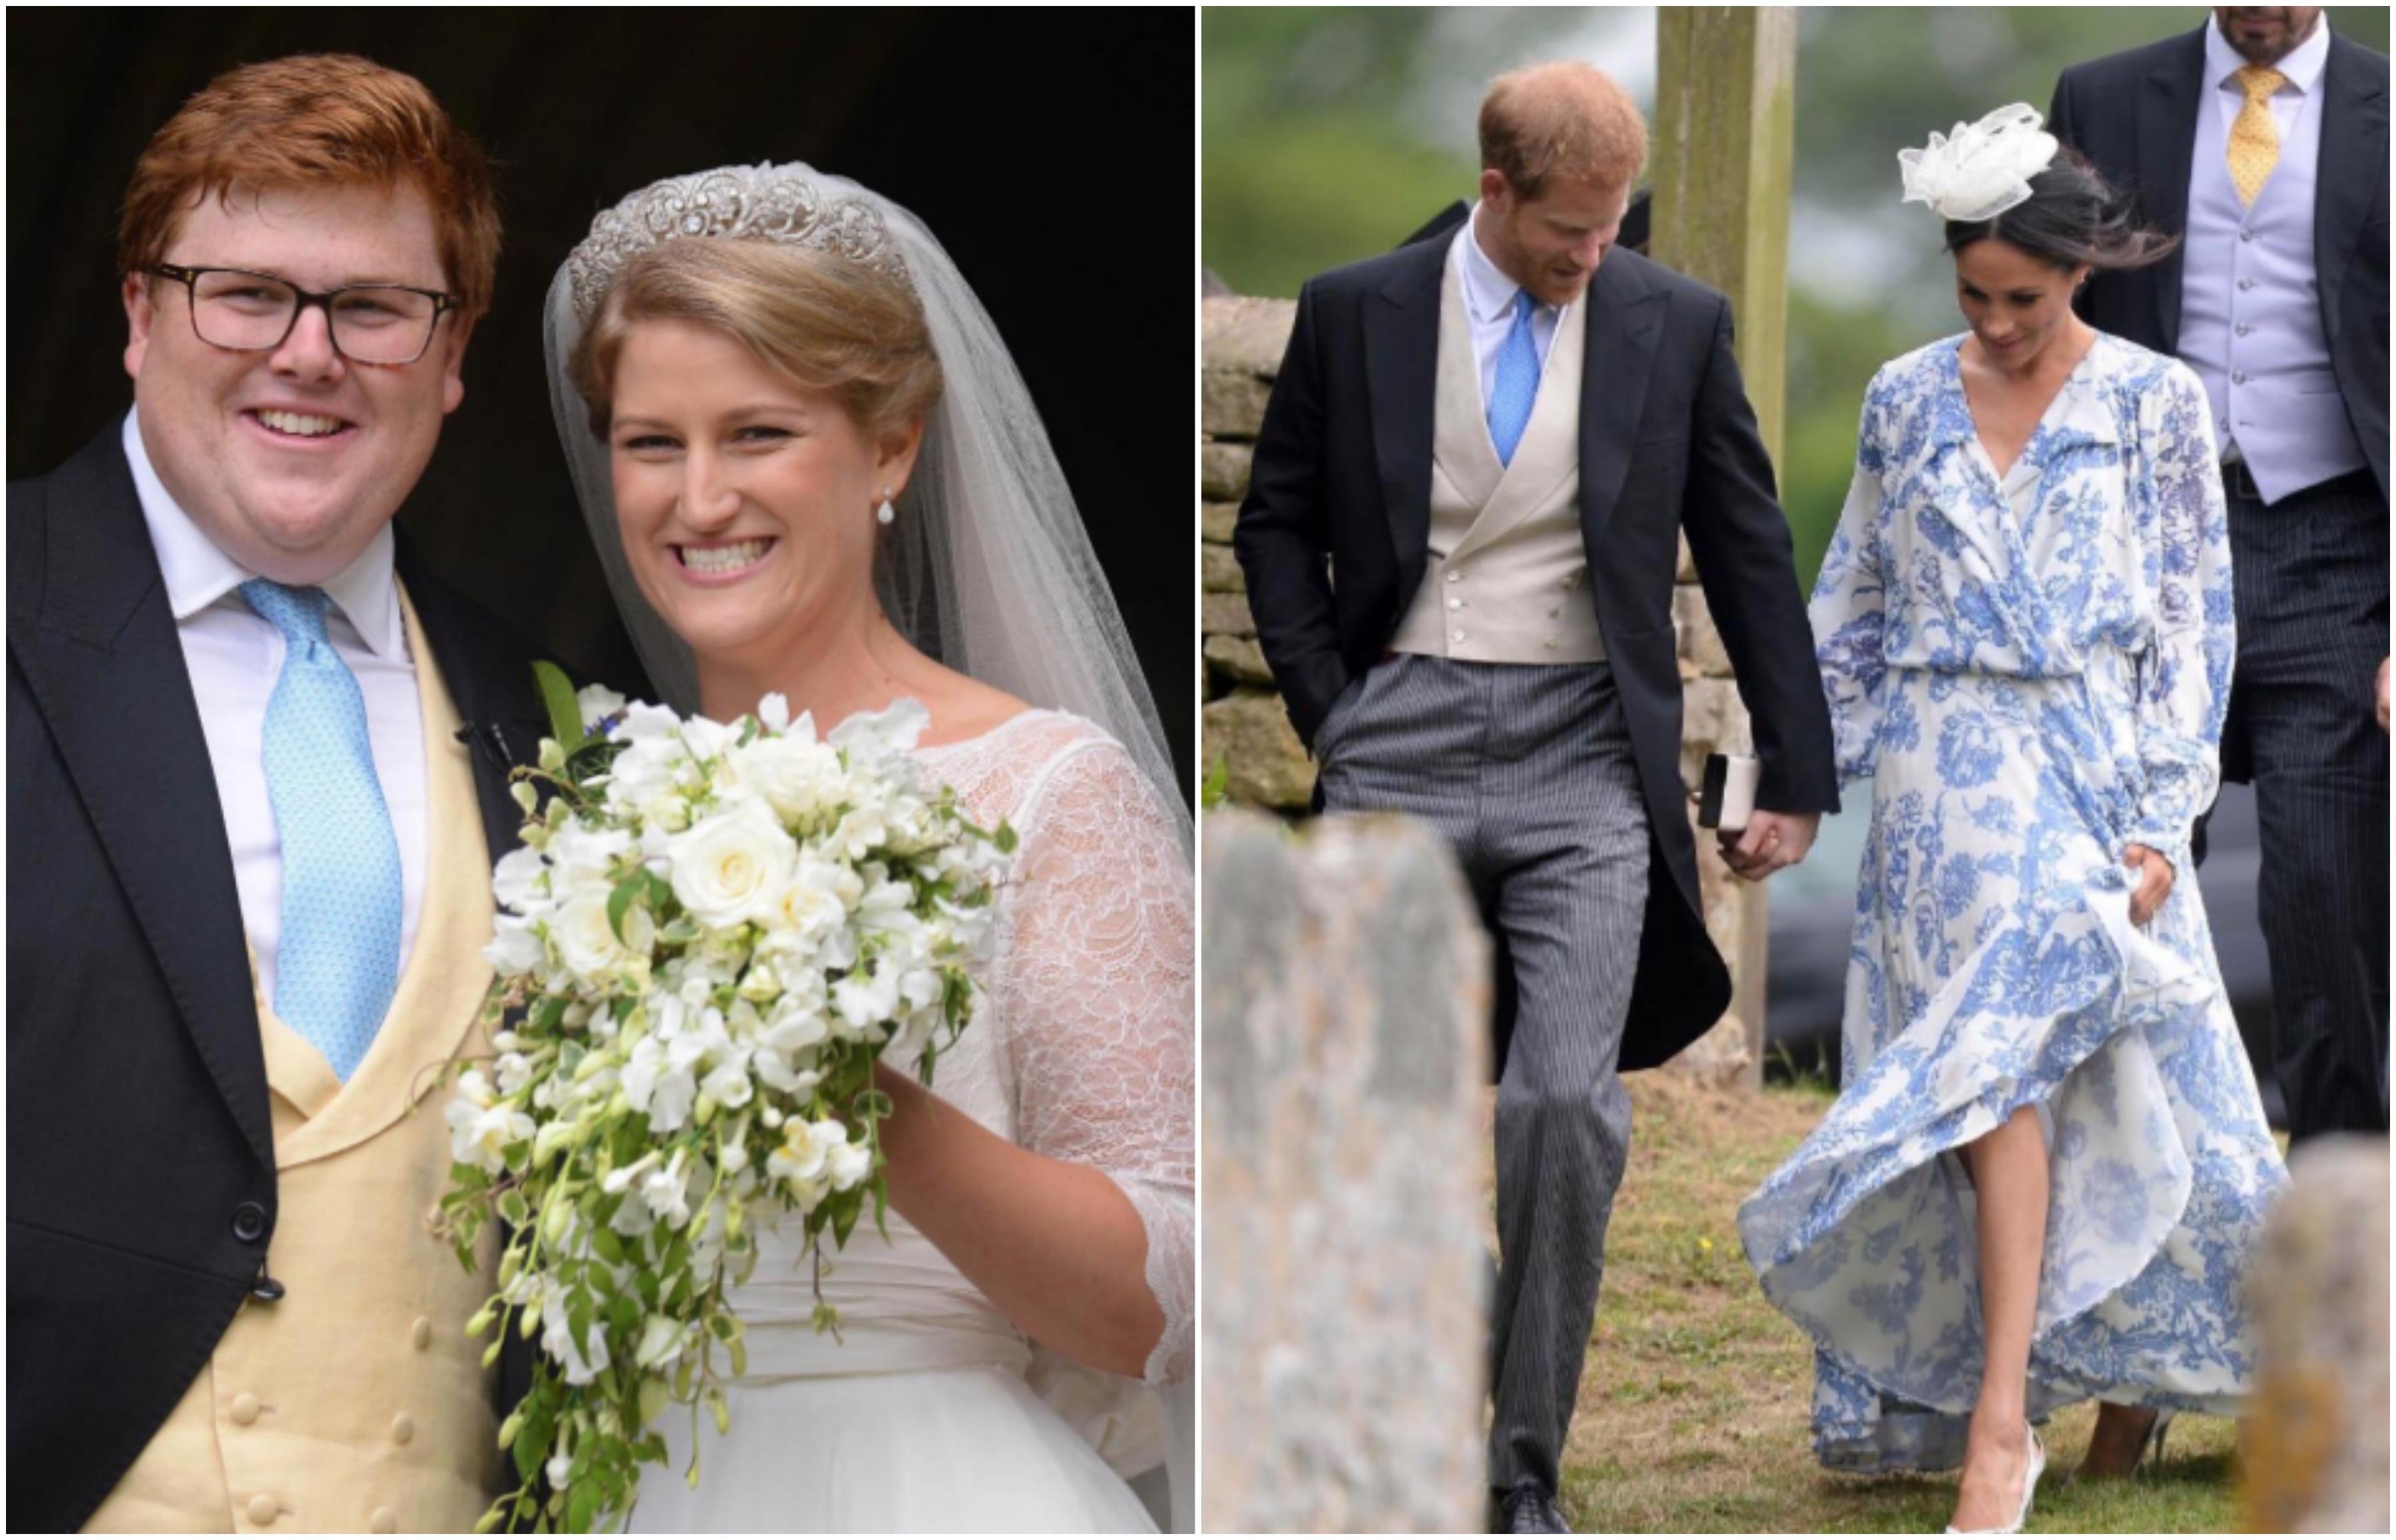 Matrimonio Megan E Harry : Meghan e harry al matrimonio di celia mrcorquodale